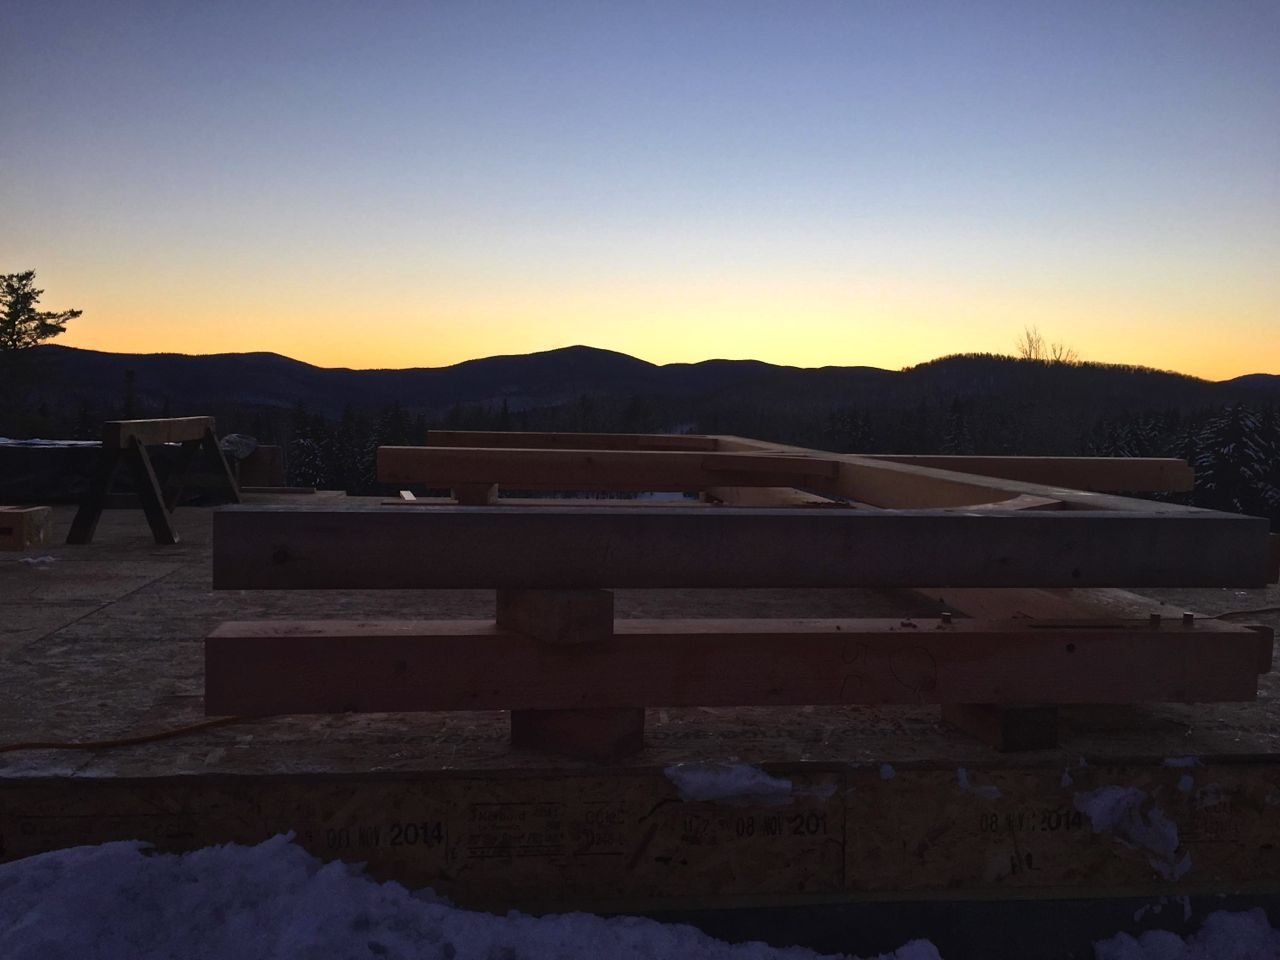 winter sky, timbers on deck